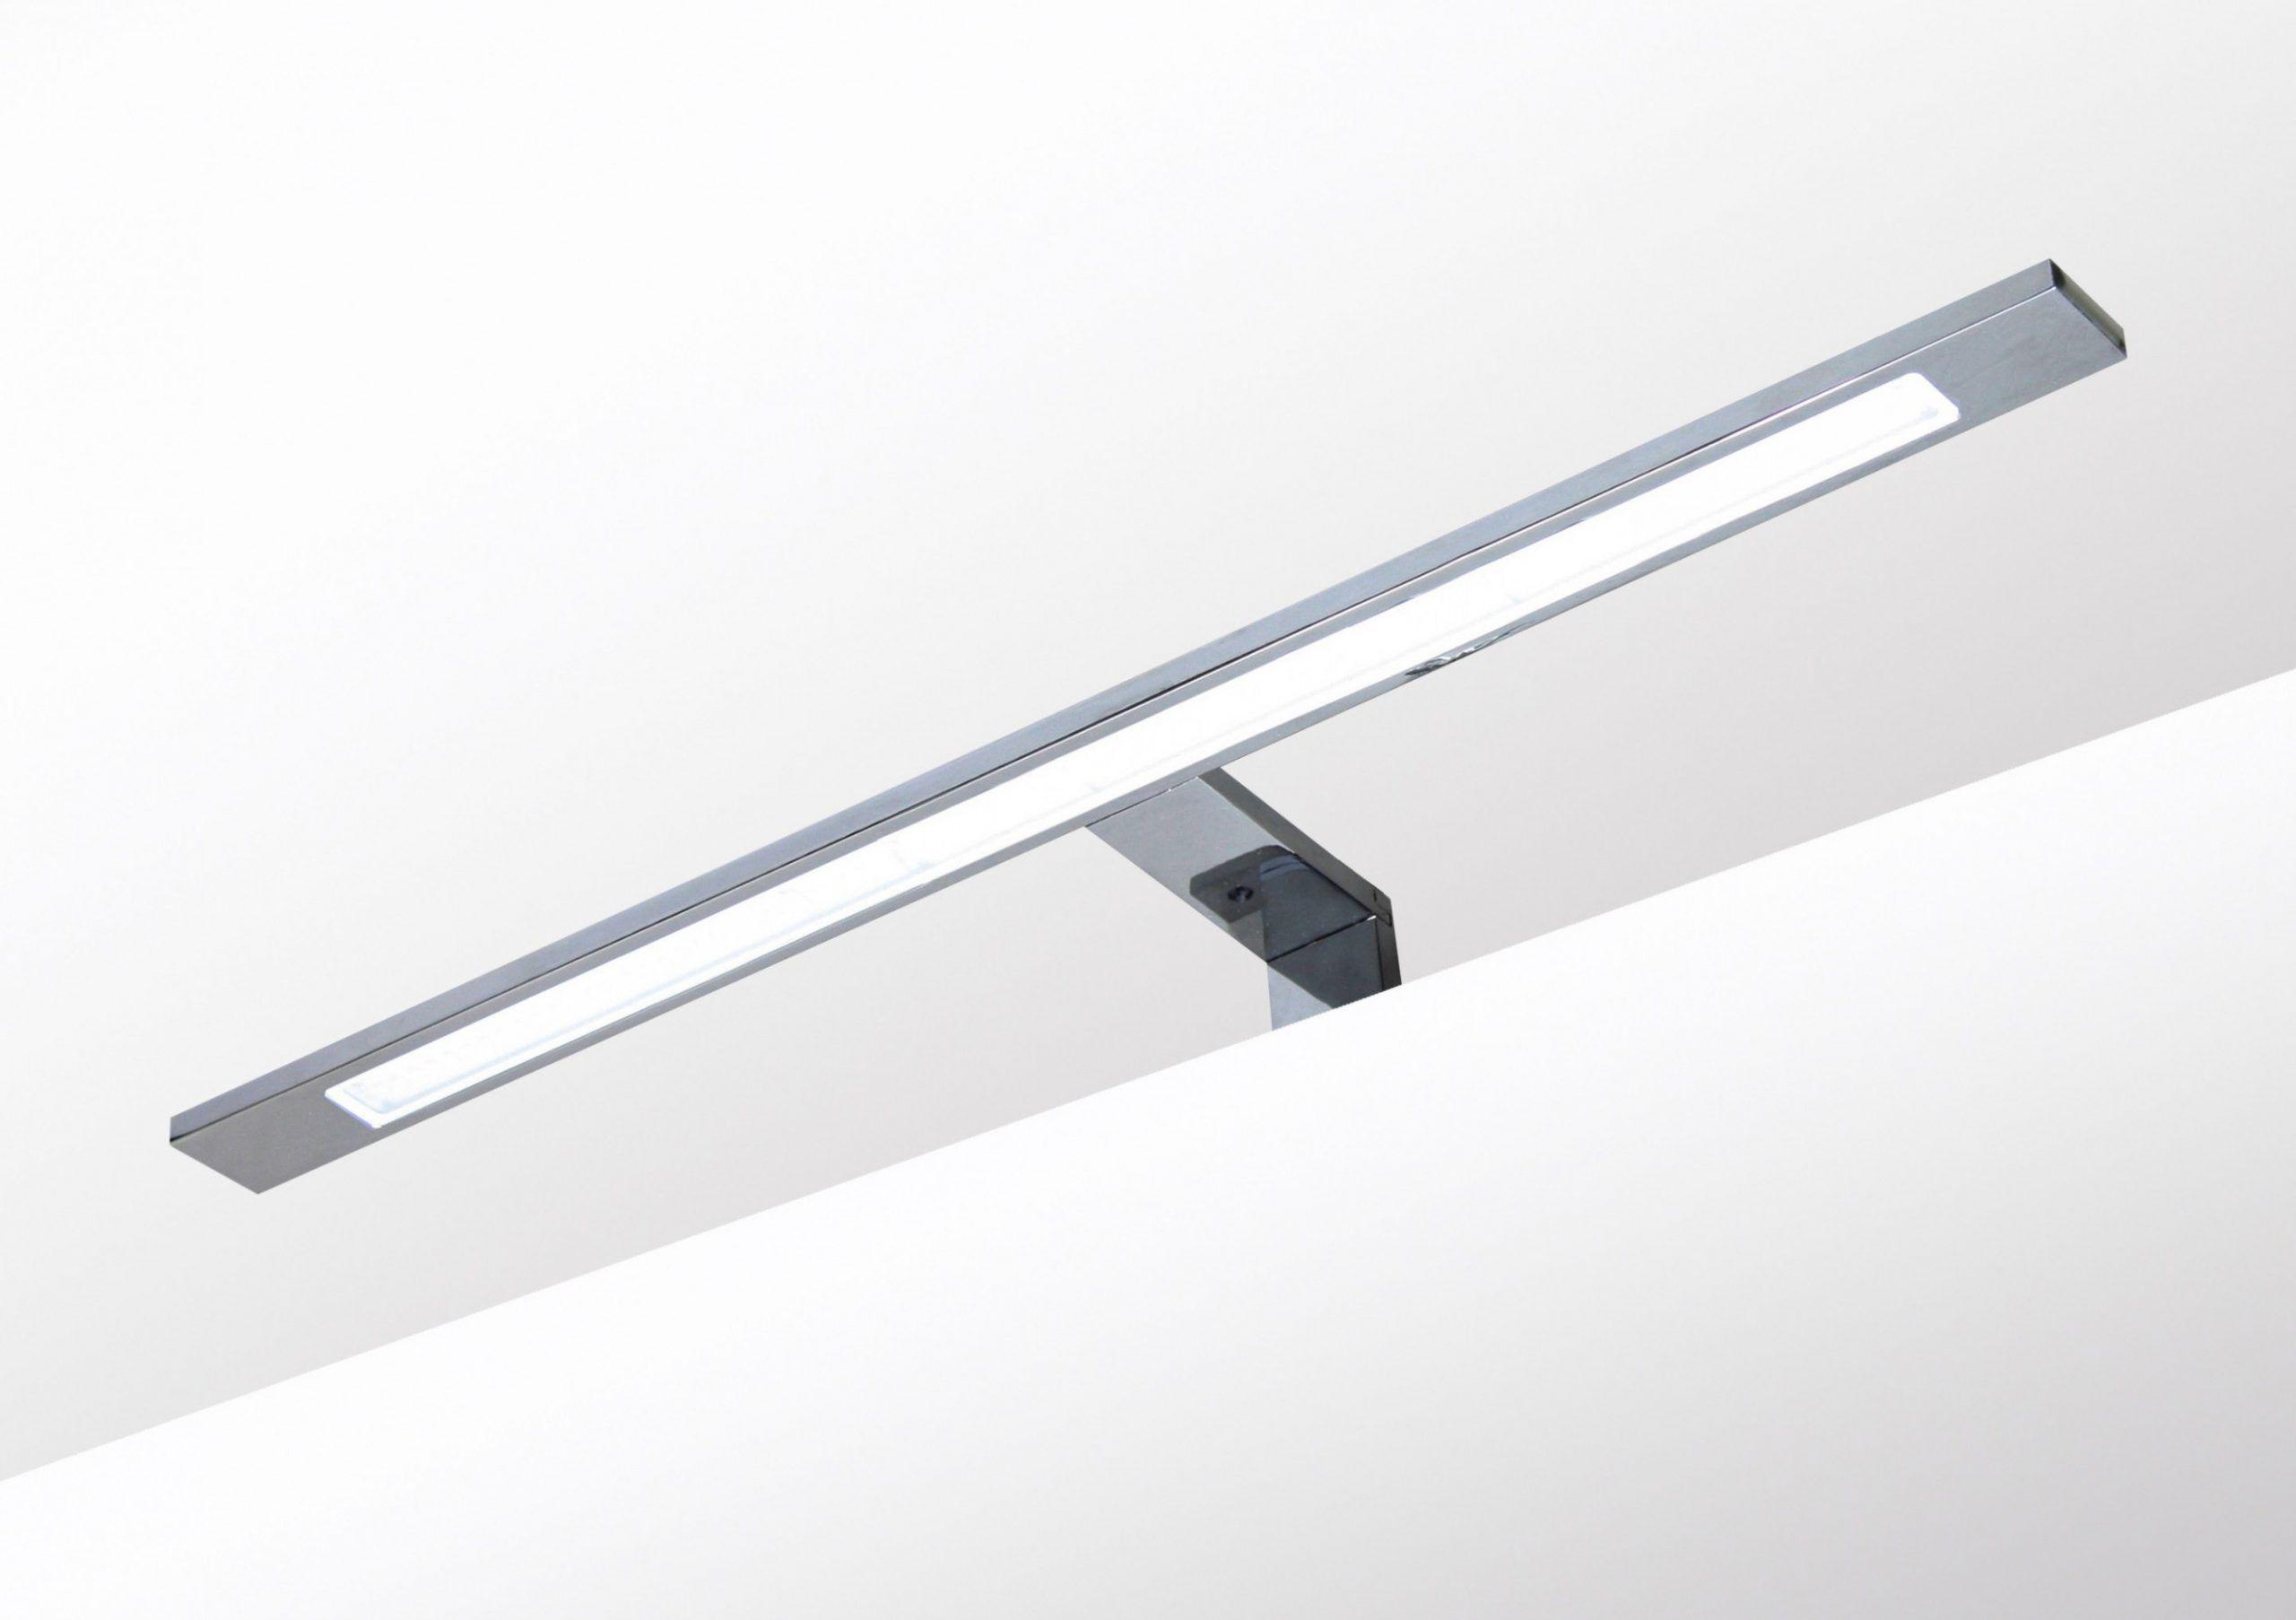 15 Kuchenlampe Led Ideen In 2020 Schone Badezimmer Kuchenlampe Led Lampe